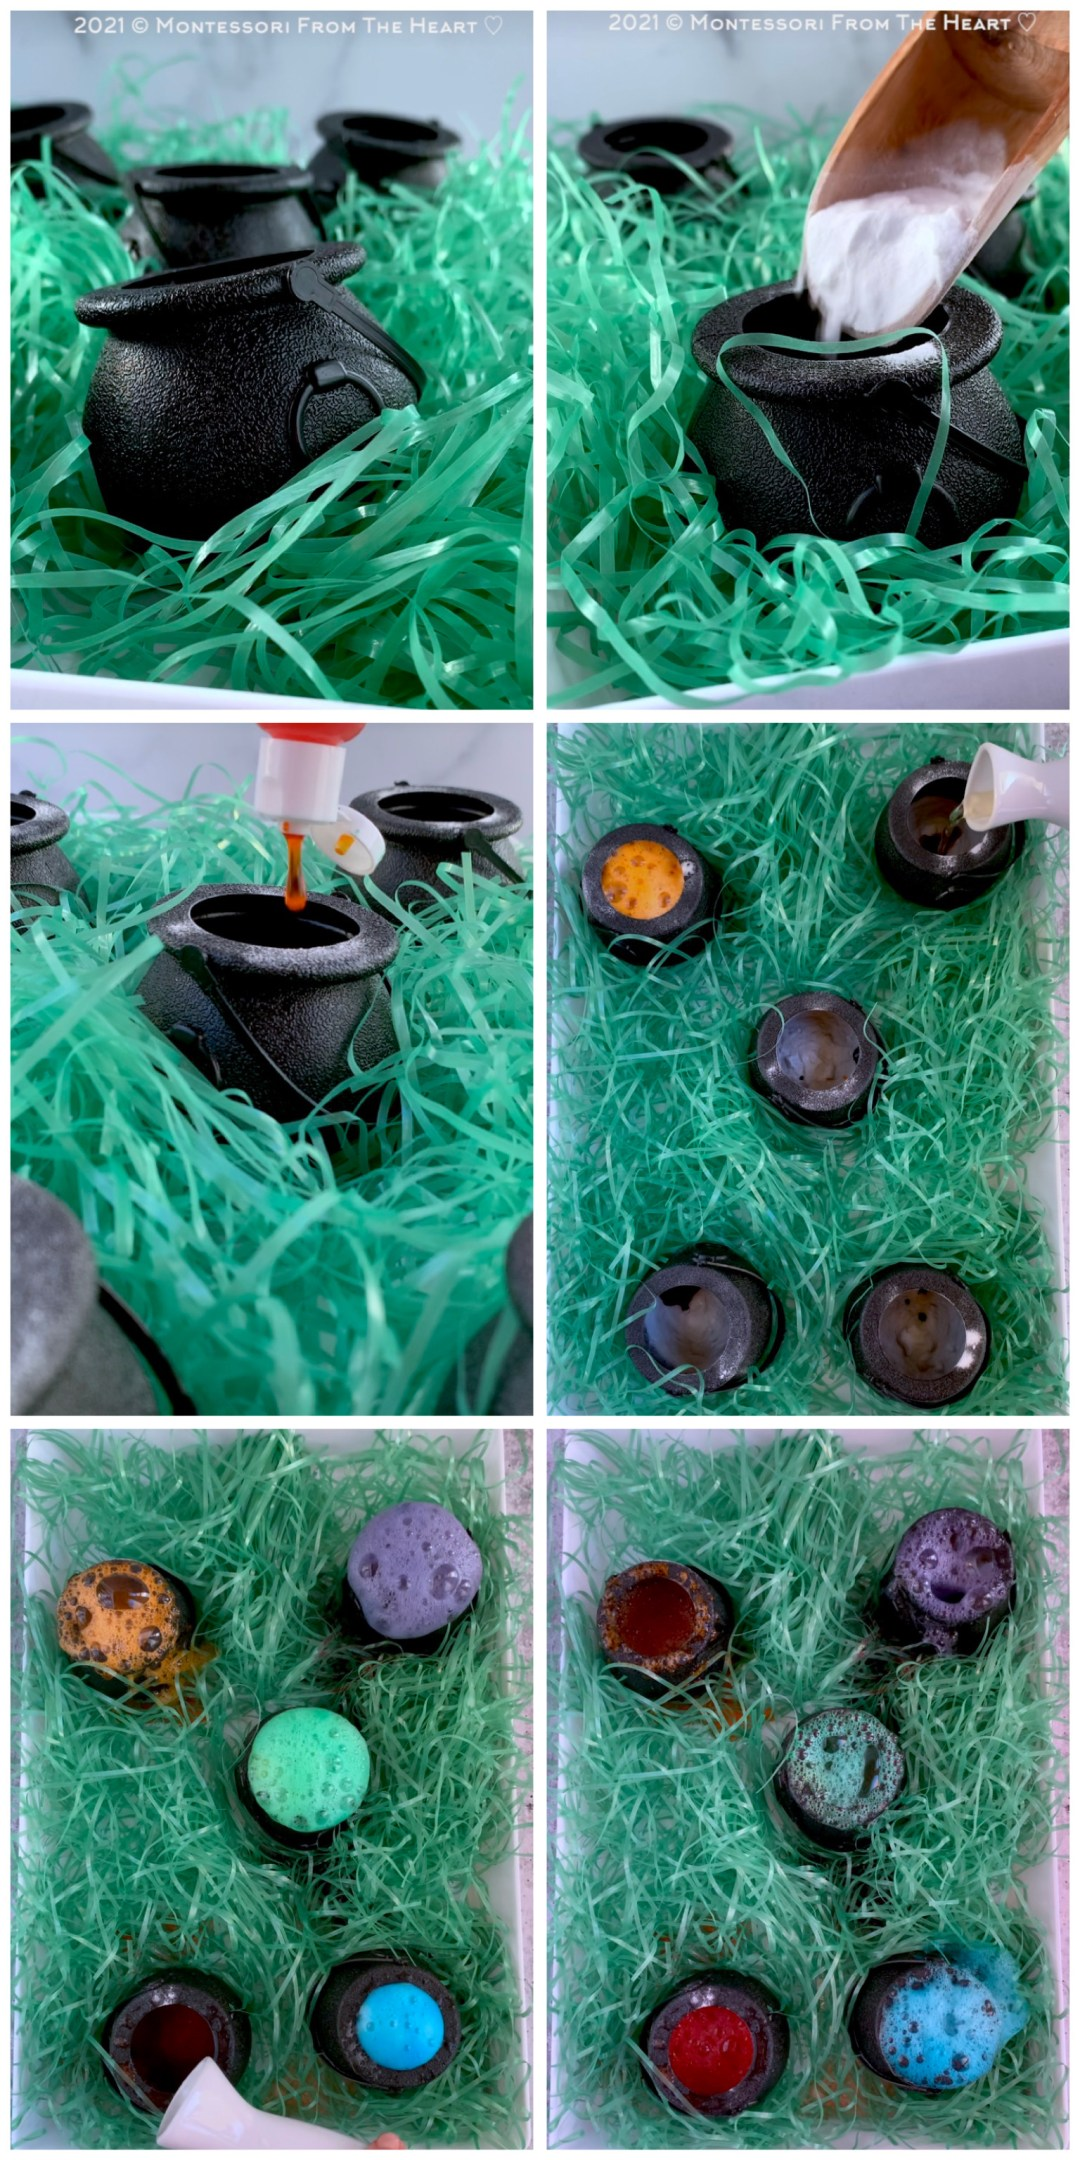 *Bubbling Fizzy Cauldron STEM TASTE-SAFE Kids Experiment